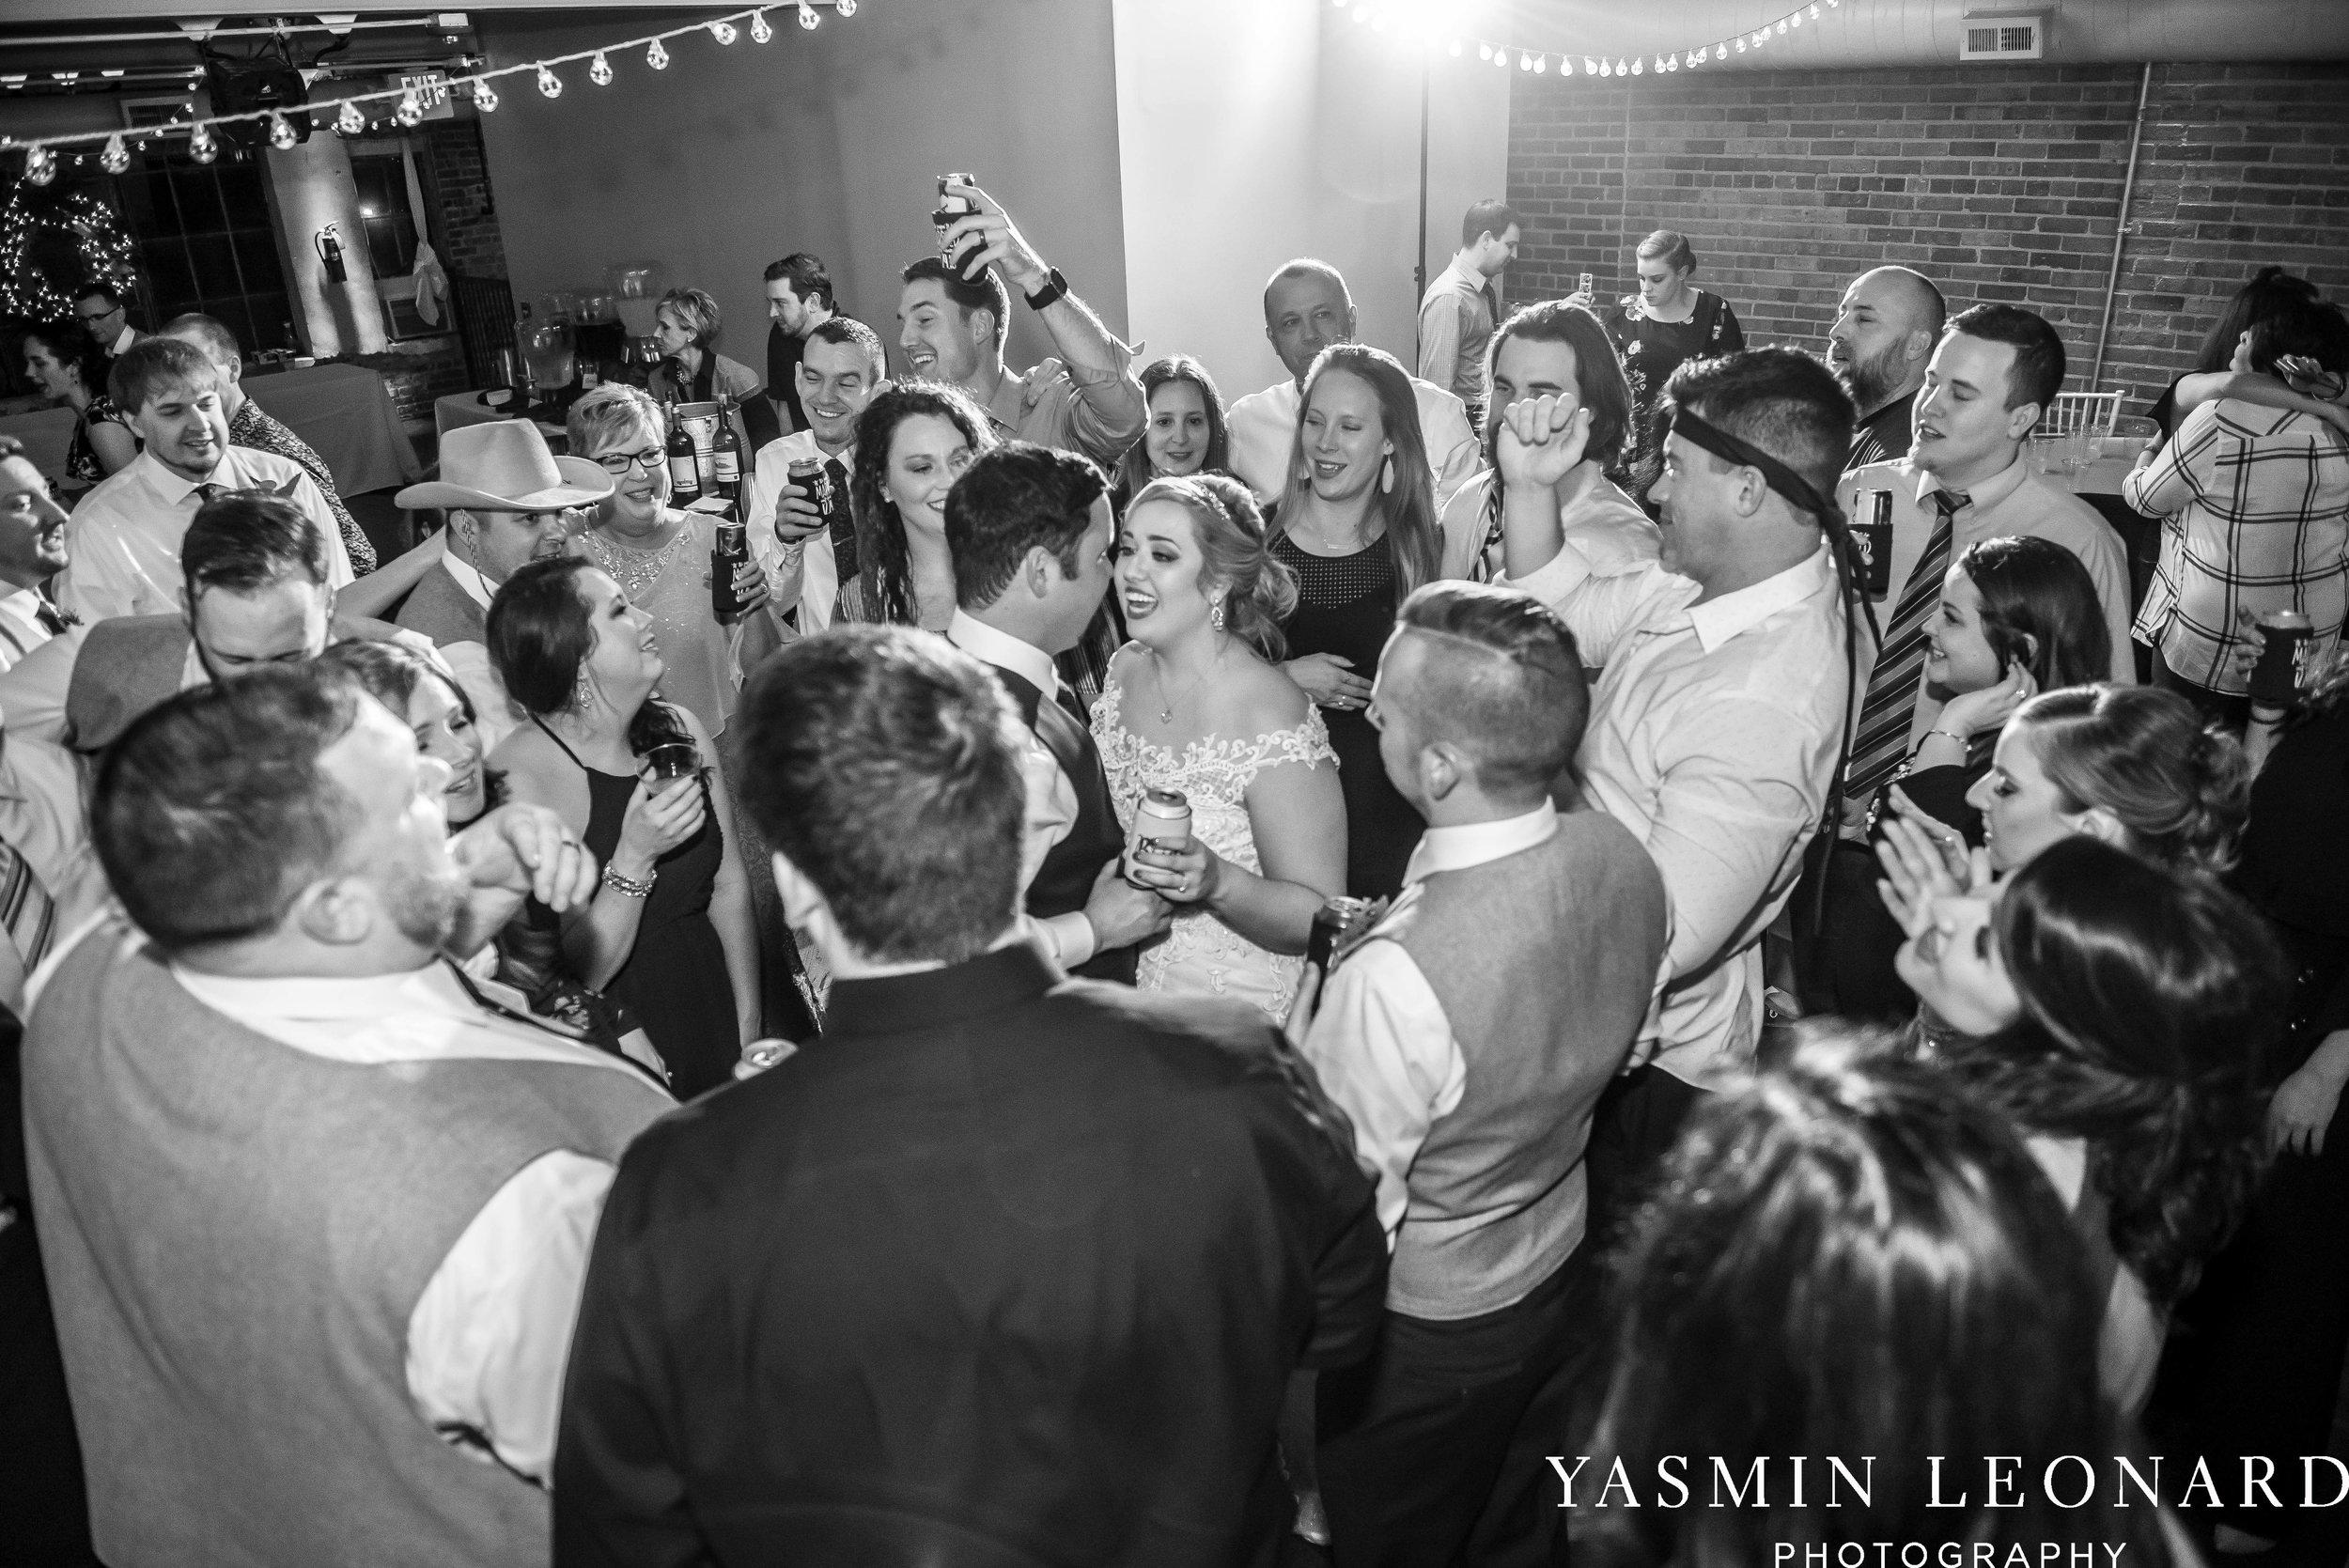 Rebekah and Matt - 105 Worth Event Centre - Yasmin Leonard Photography - Asheboro Wedding - NC Wedding - High Point Weddings - Triad Weddings - Winter Wedding-80.jpg